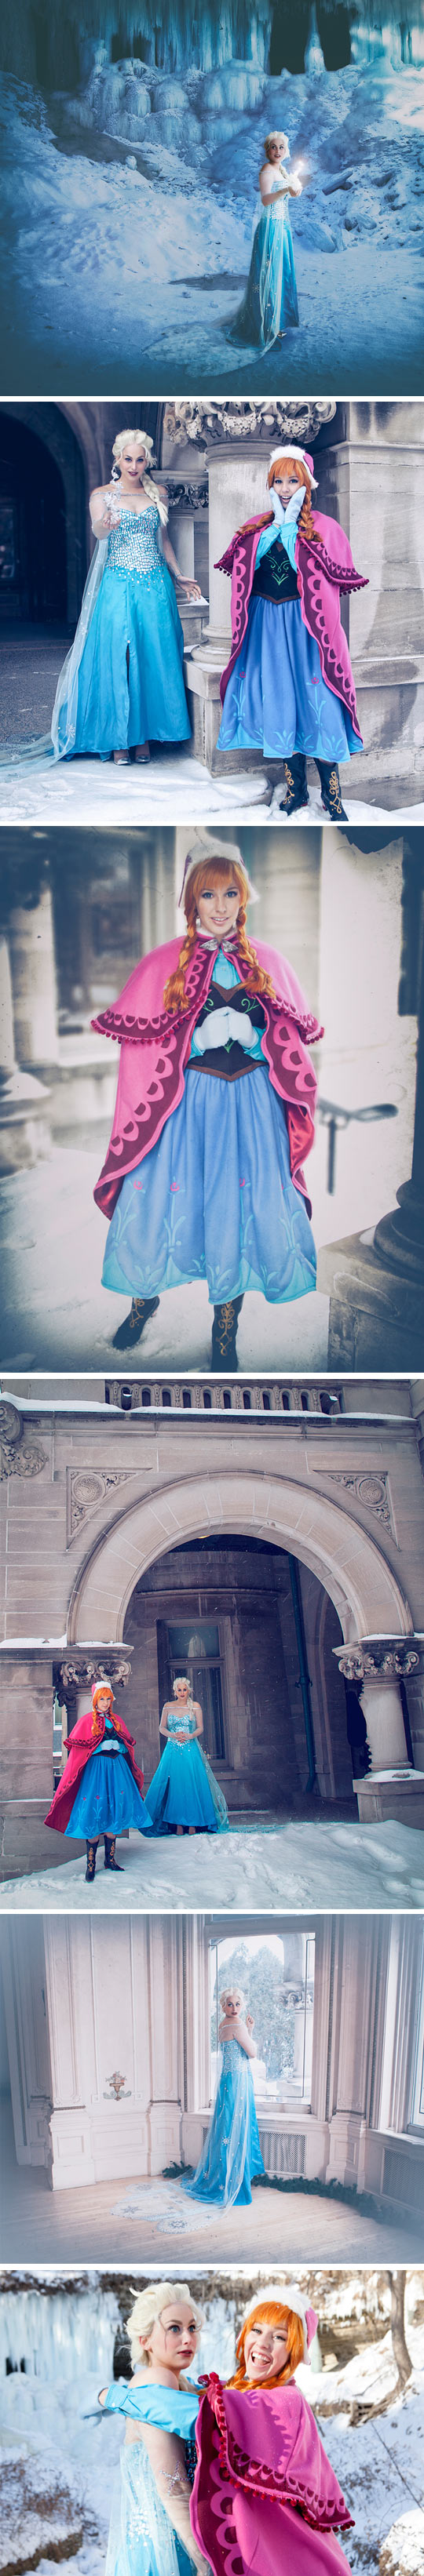 funny-costume-Disney-Frozen-characters-cosplay